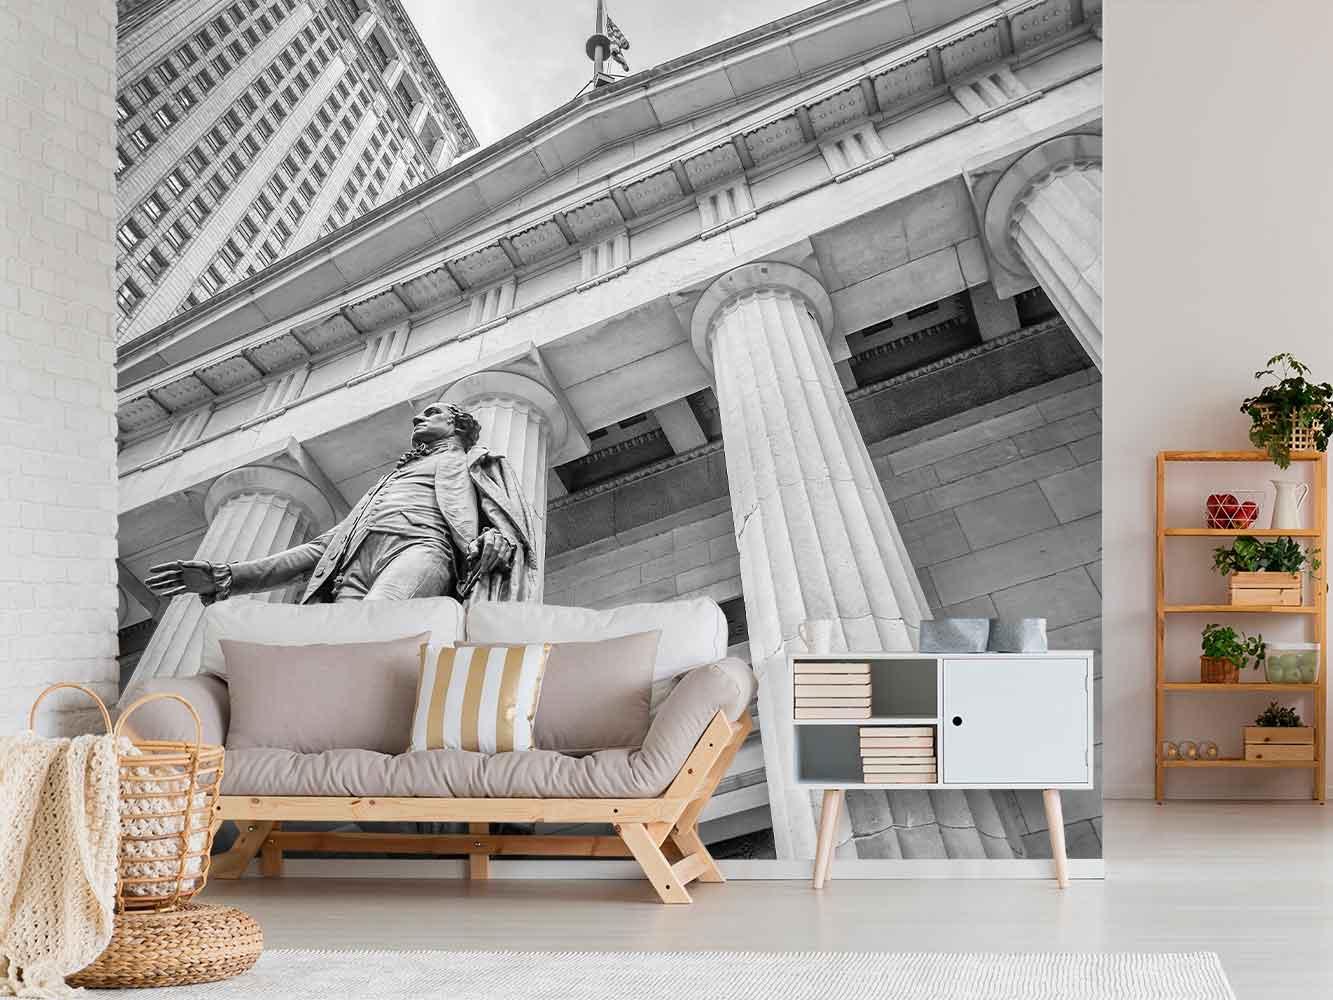 Fotomural Wall Street Blanco y Negro | Carteles XXL - Impresión carteleria publicitaria